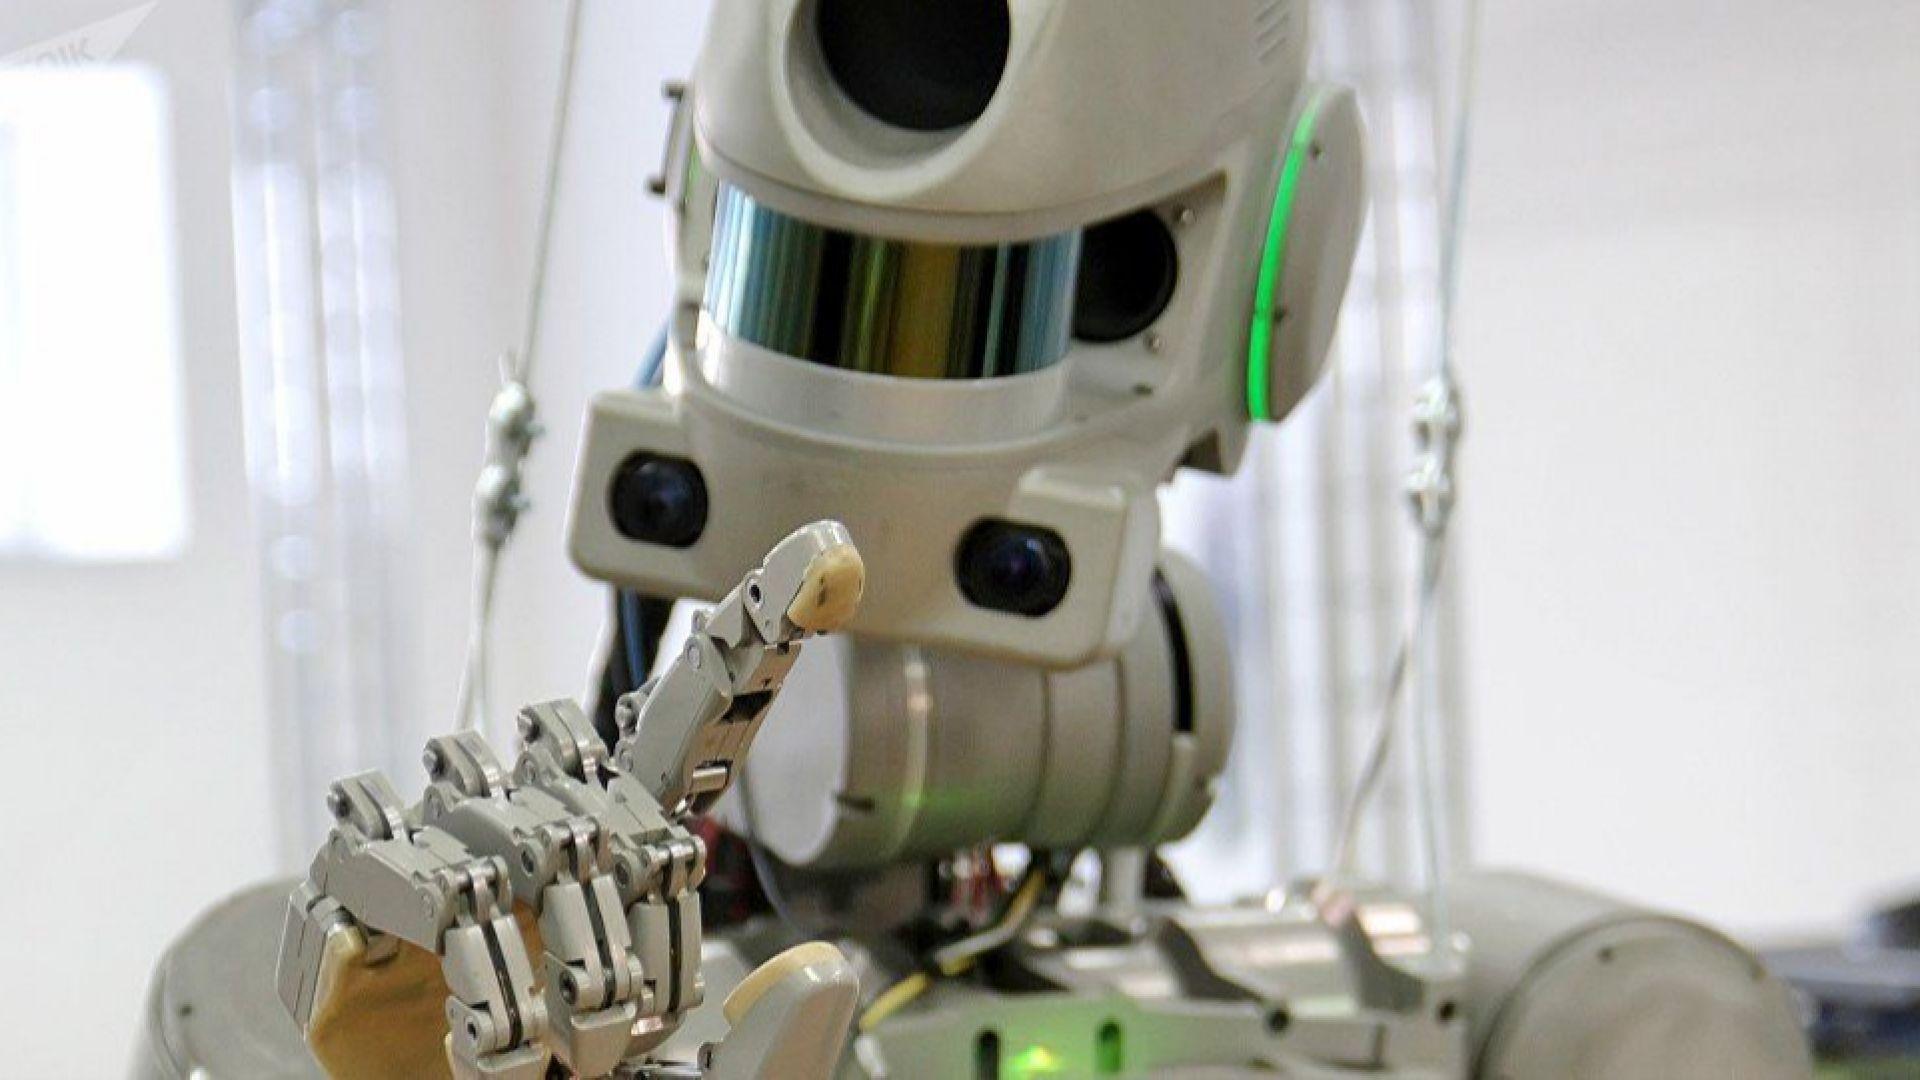 Ембарго над руския робот, можещ да стреля с пистолети